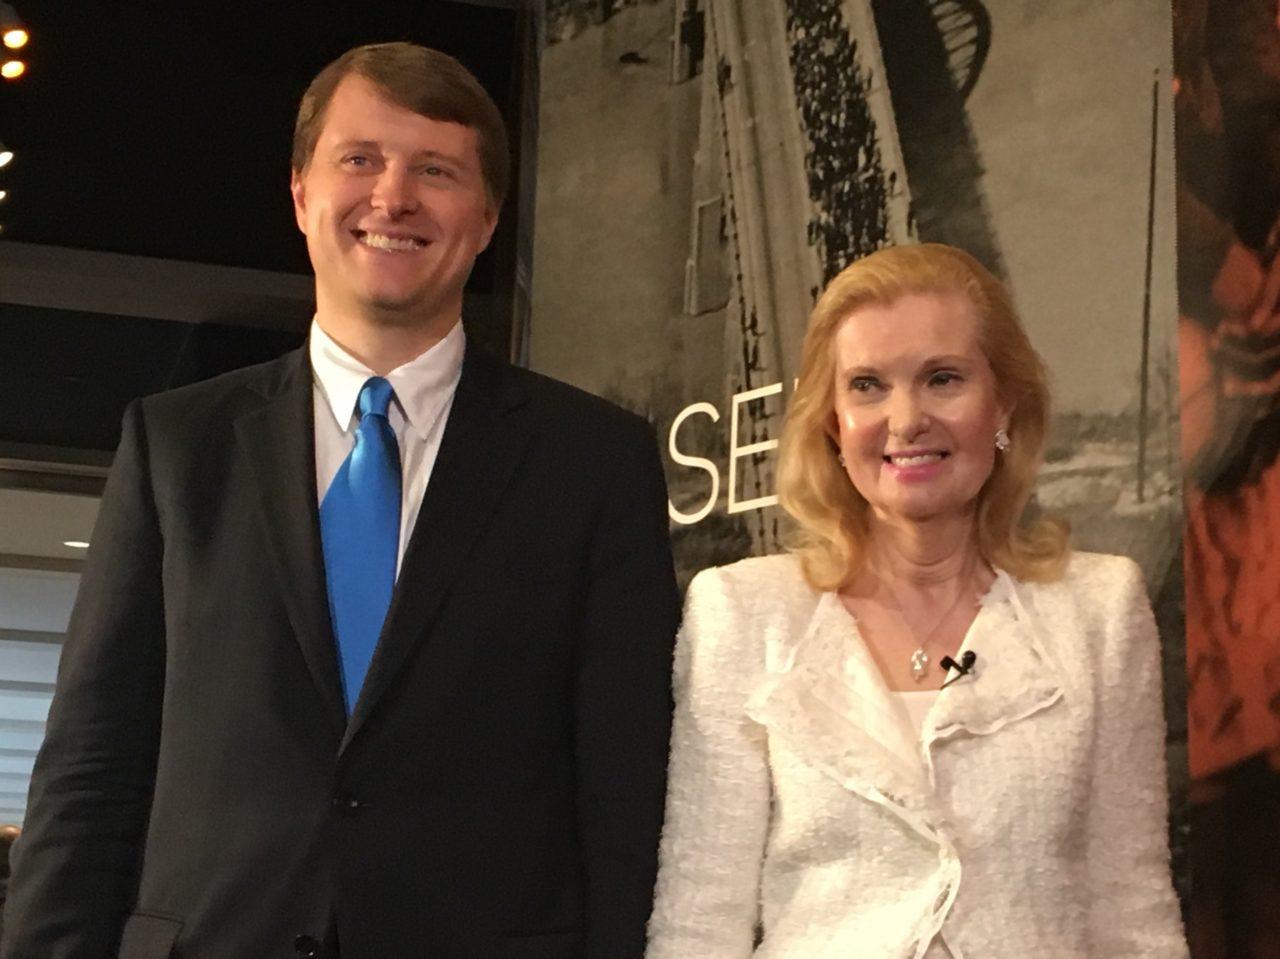 Edward Cox and Trisha Nixon (Adelle Nazarian / Breitbart News)